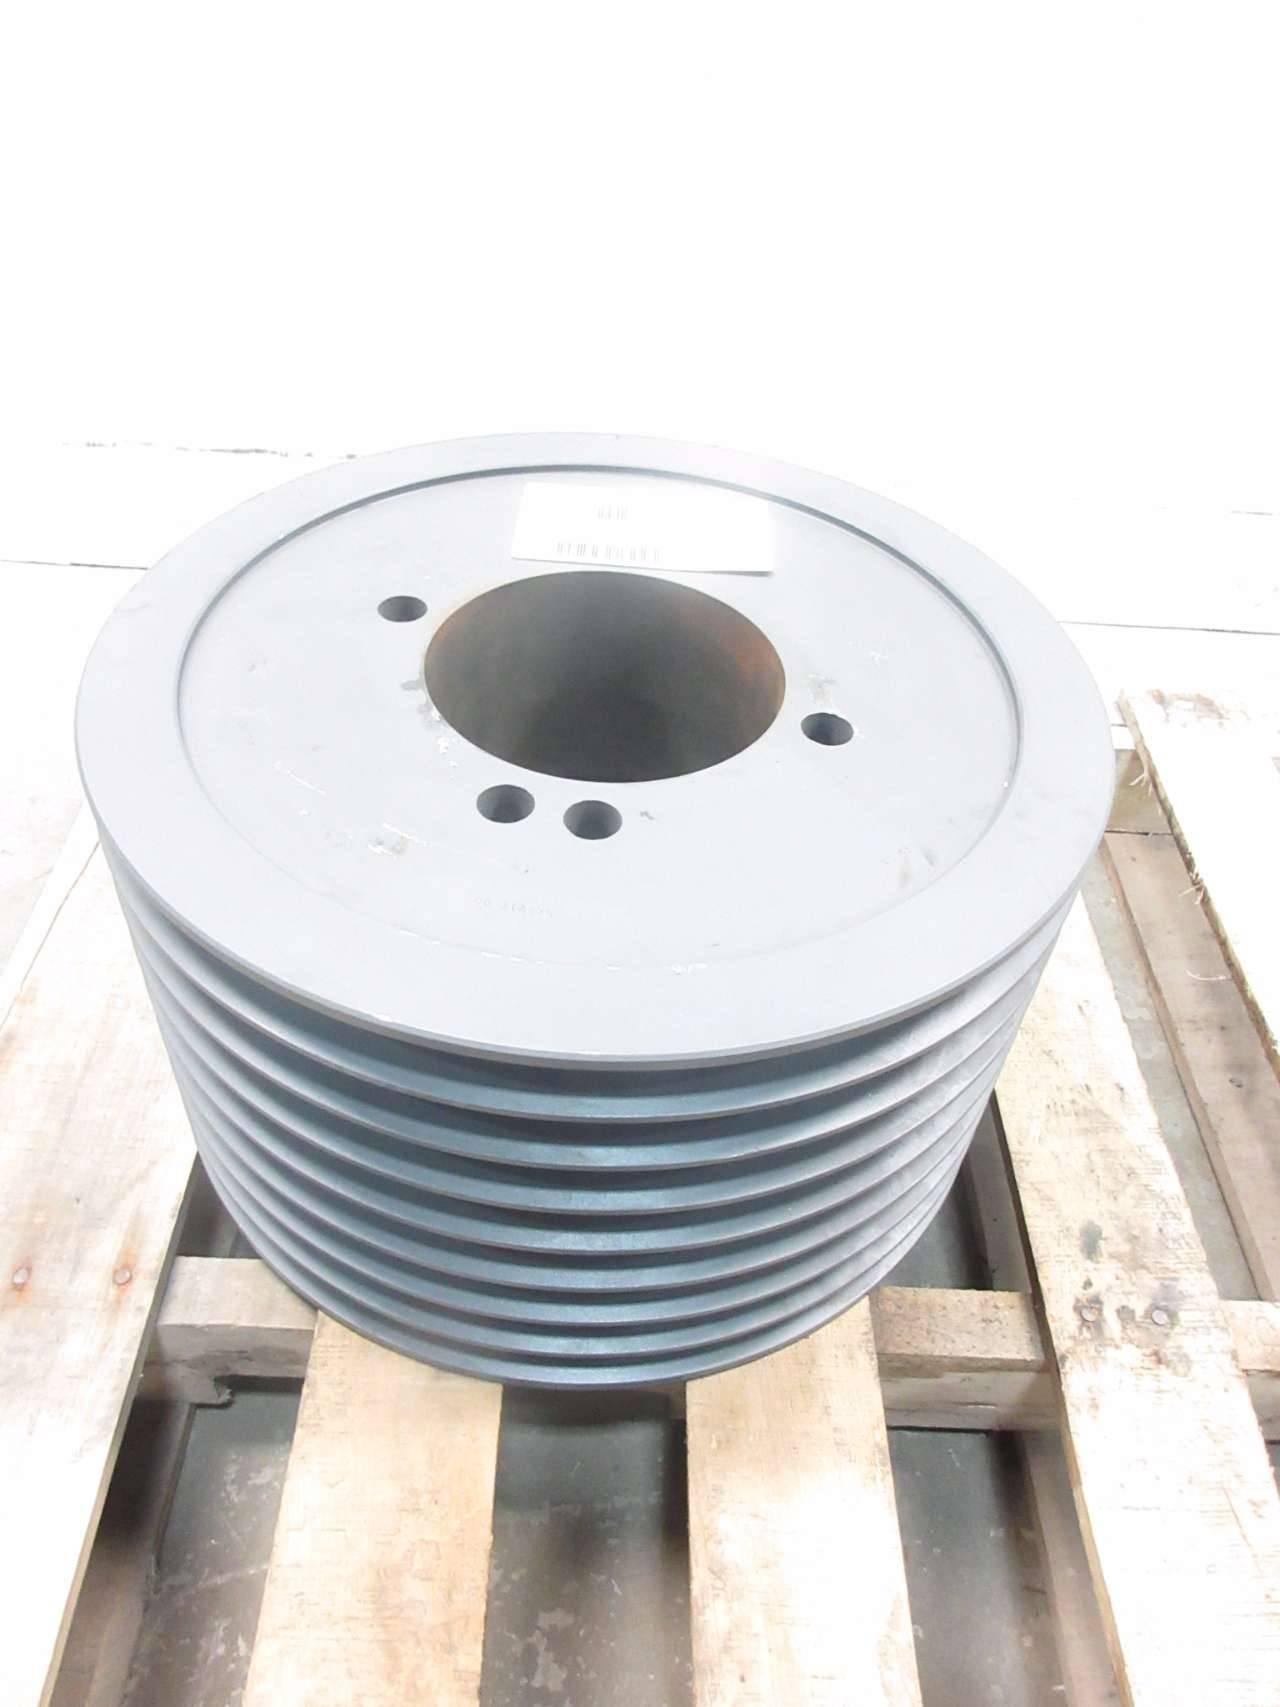 Grid DODGE 8-8V17.00-M SHEAVE 455463 Power Transmission Products ...